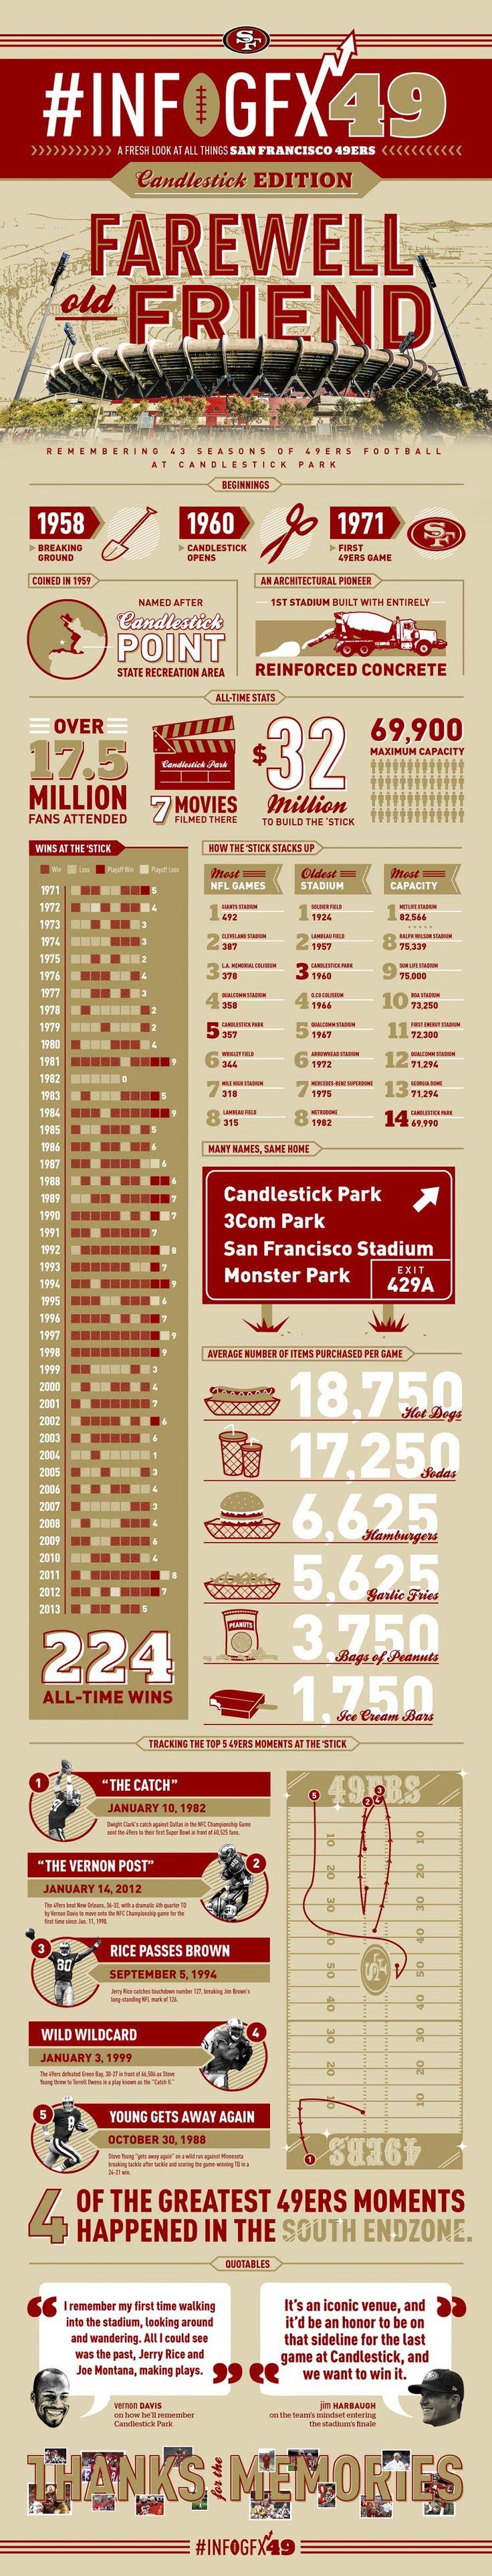 San Francisco 49ers Infographic Captures Candlestick Park's Glorious History #Infogfx49 #FarewellCandlestick